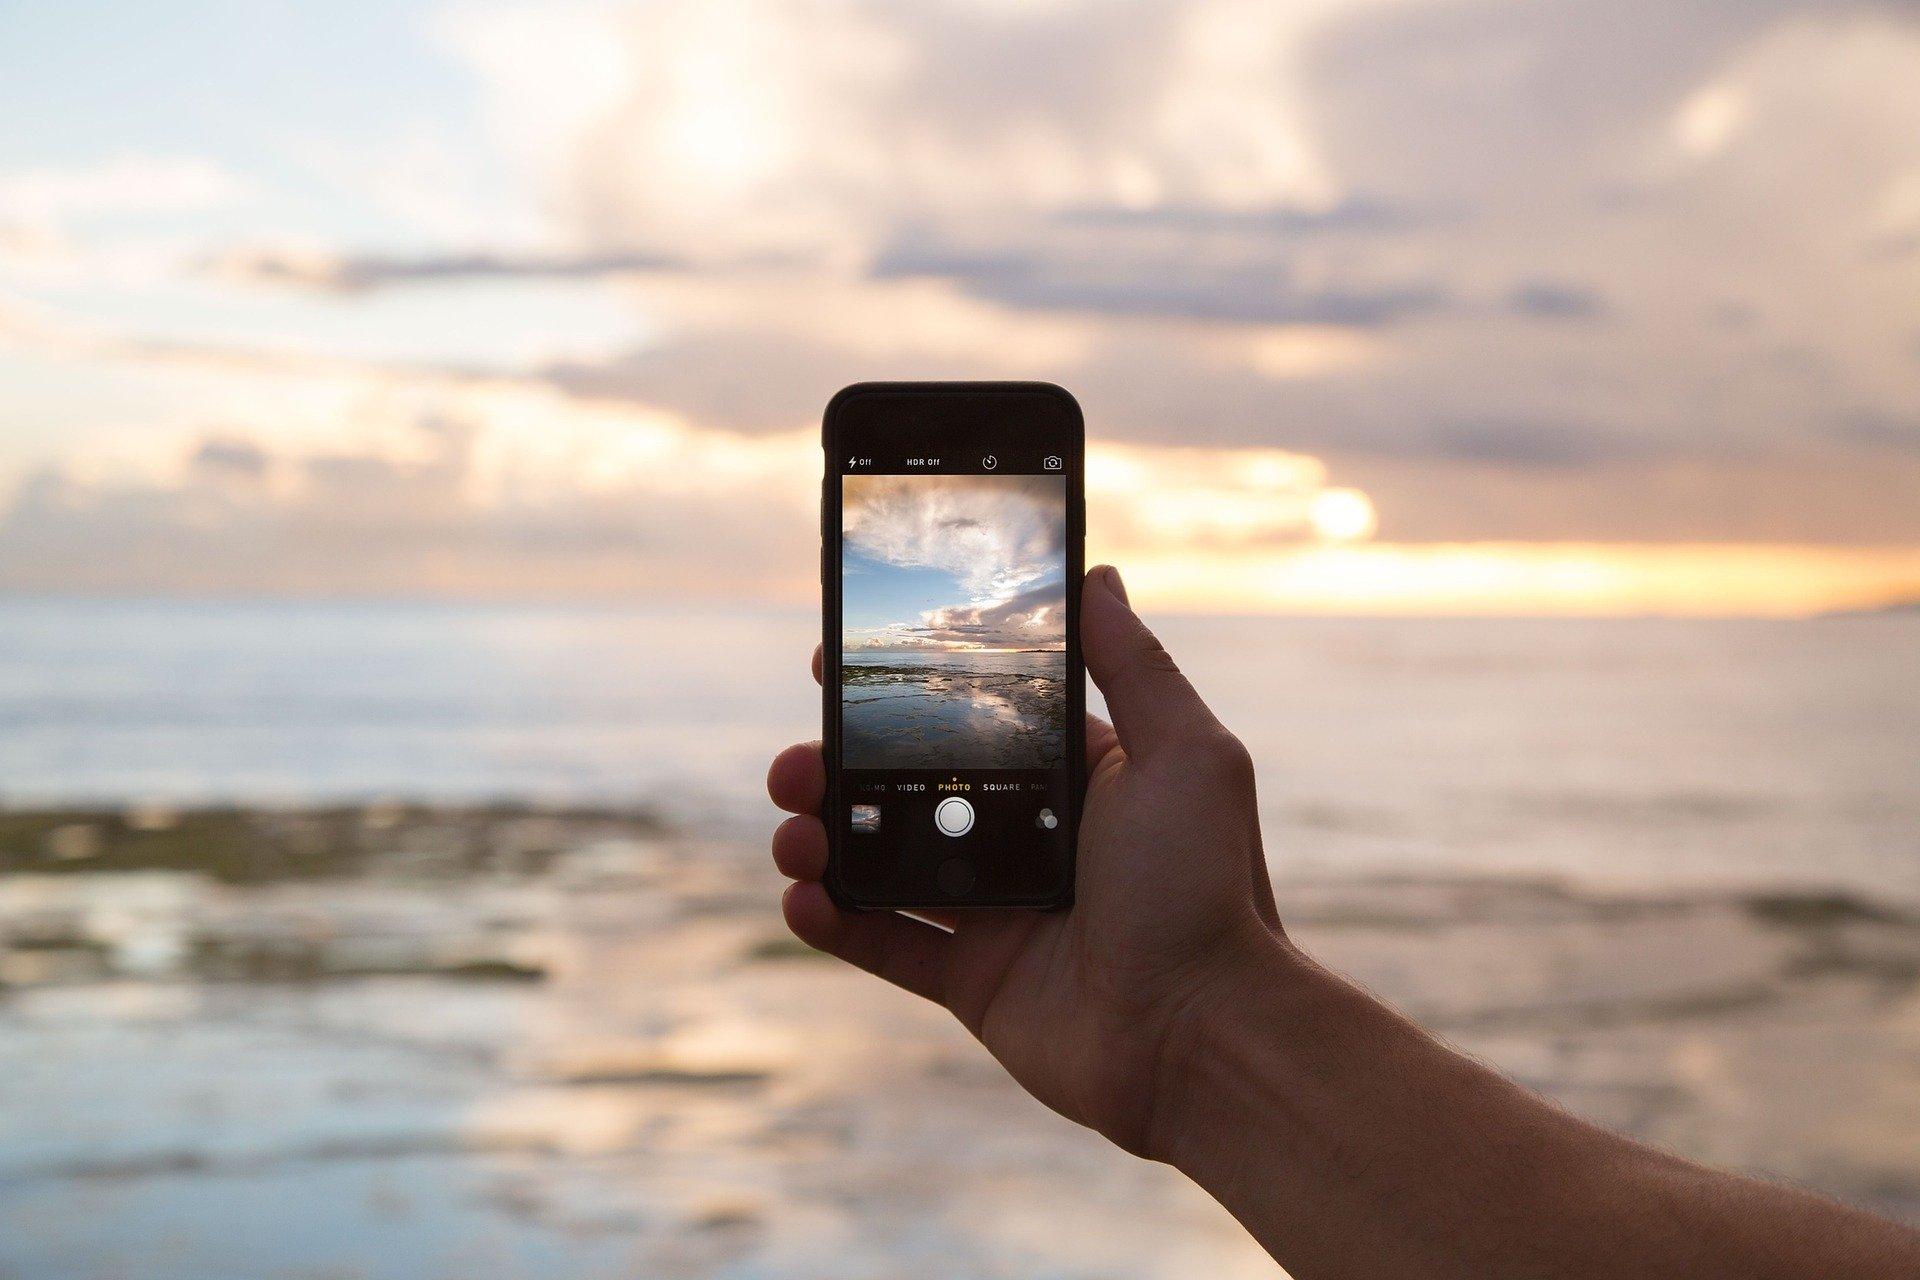 Environmental costs of smartphones